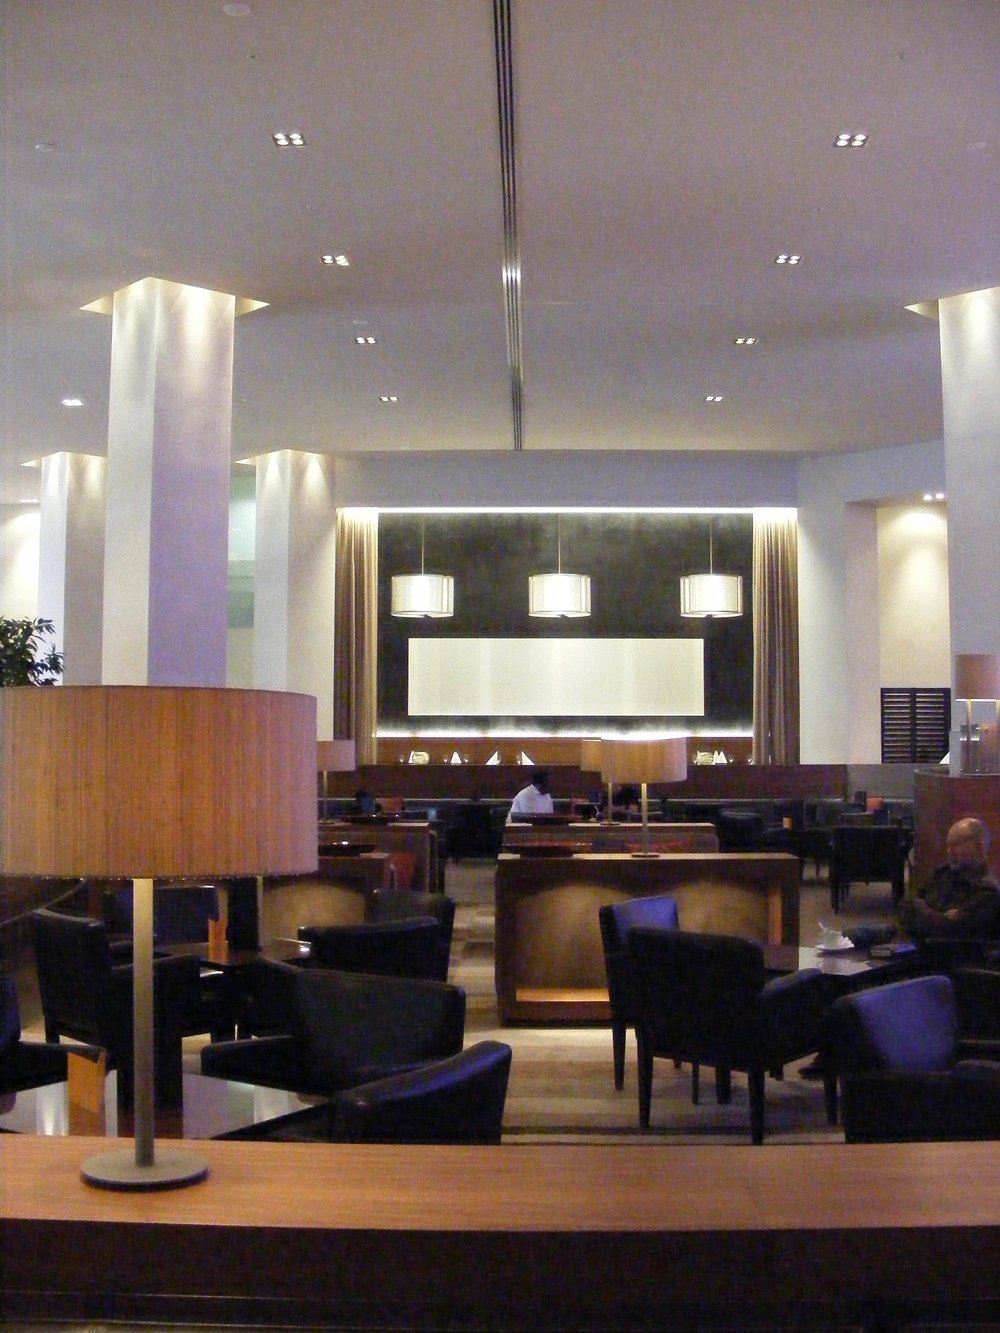 Hotel ii. ARTTFORM art advisory art consultant services Auckland.JPG